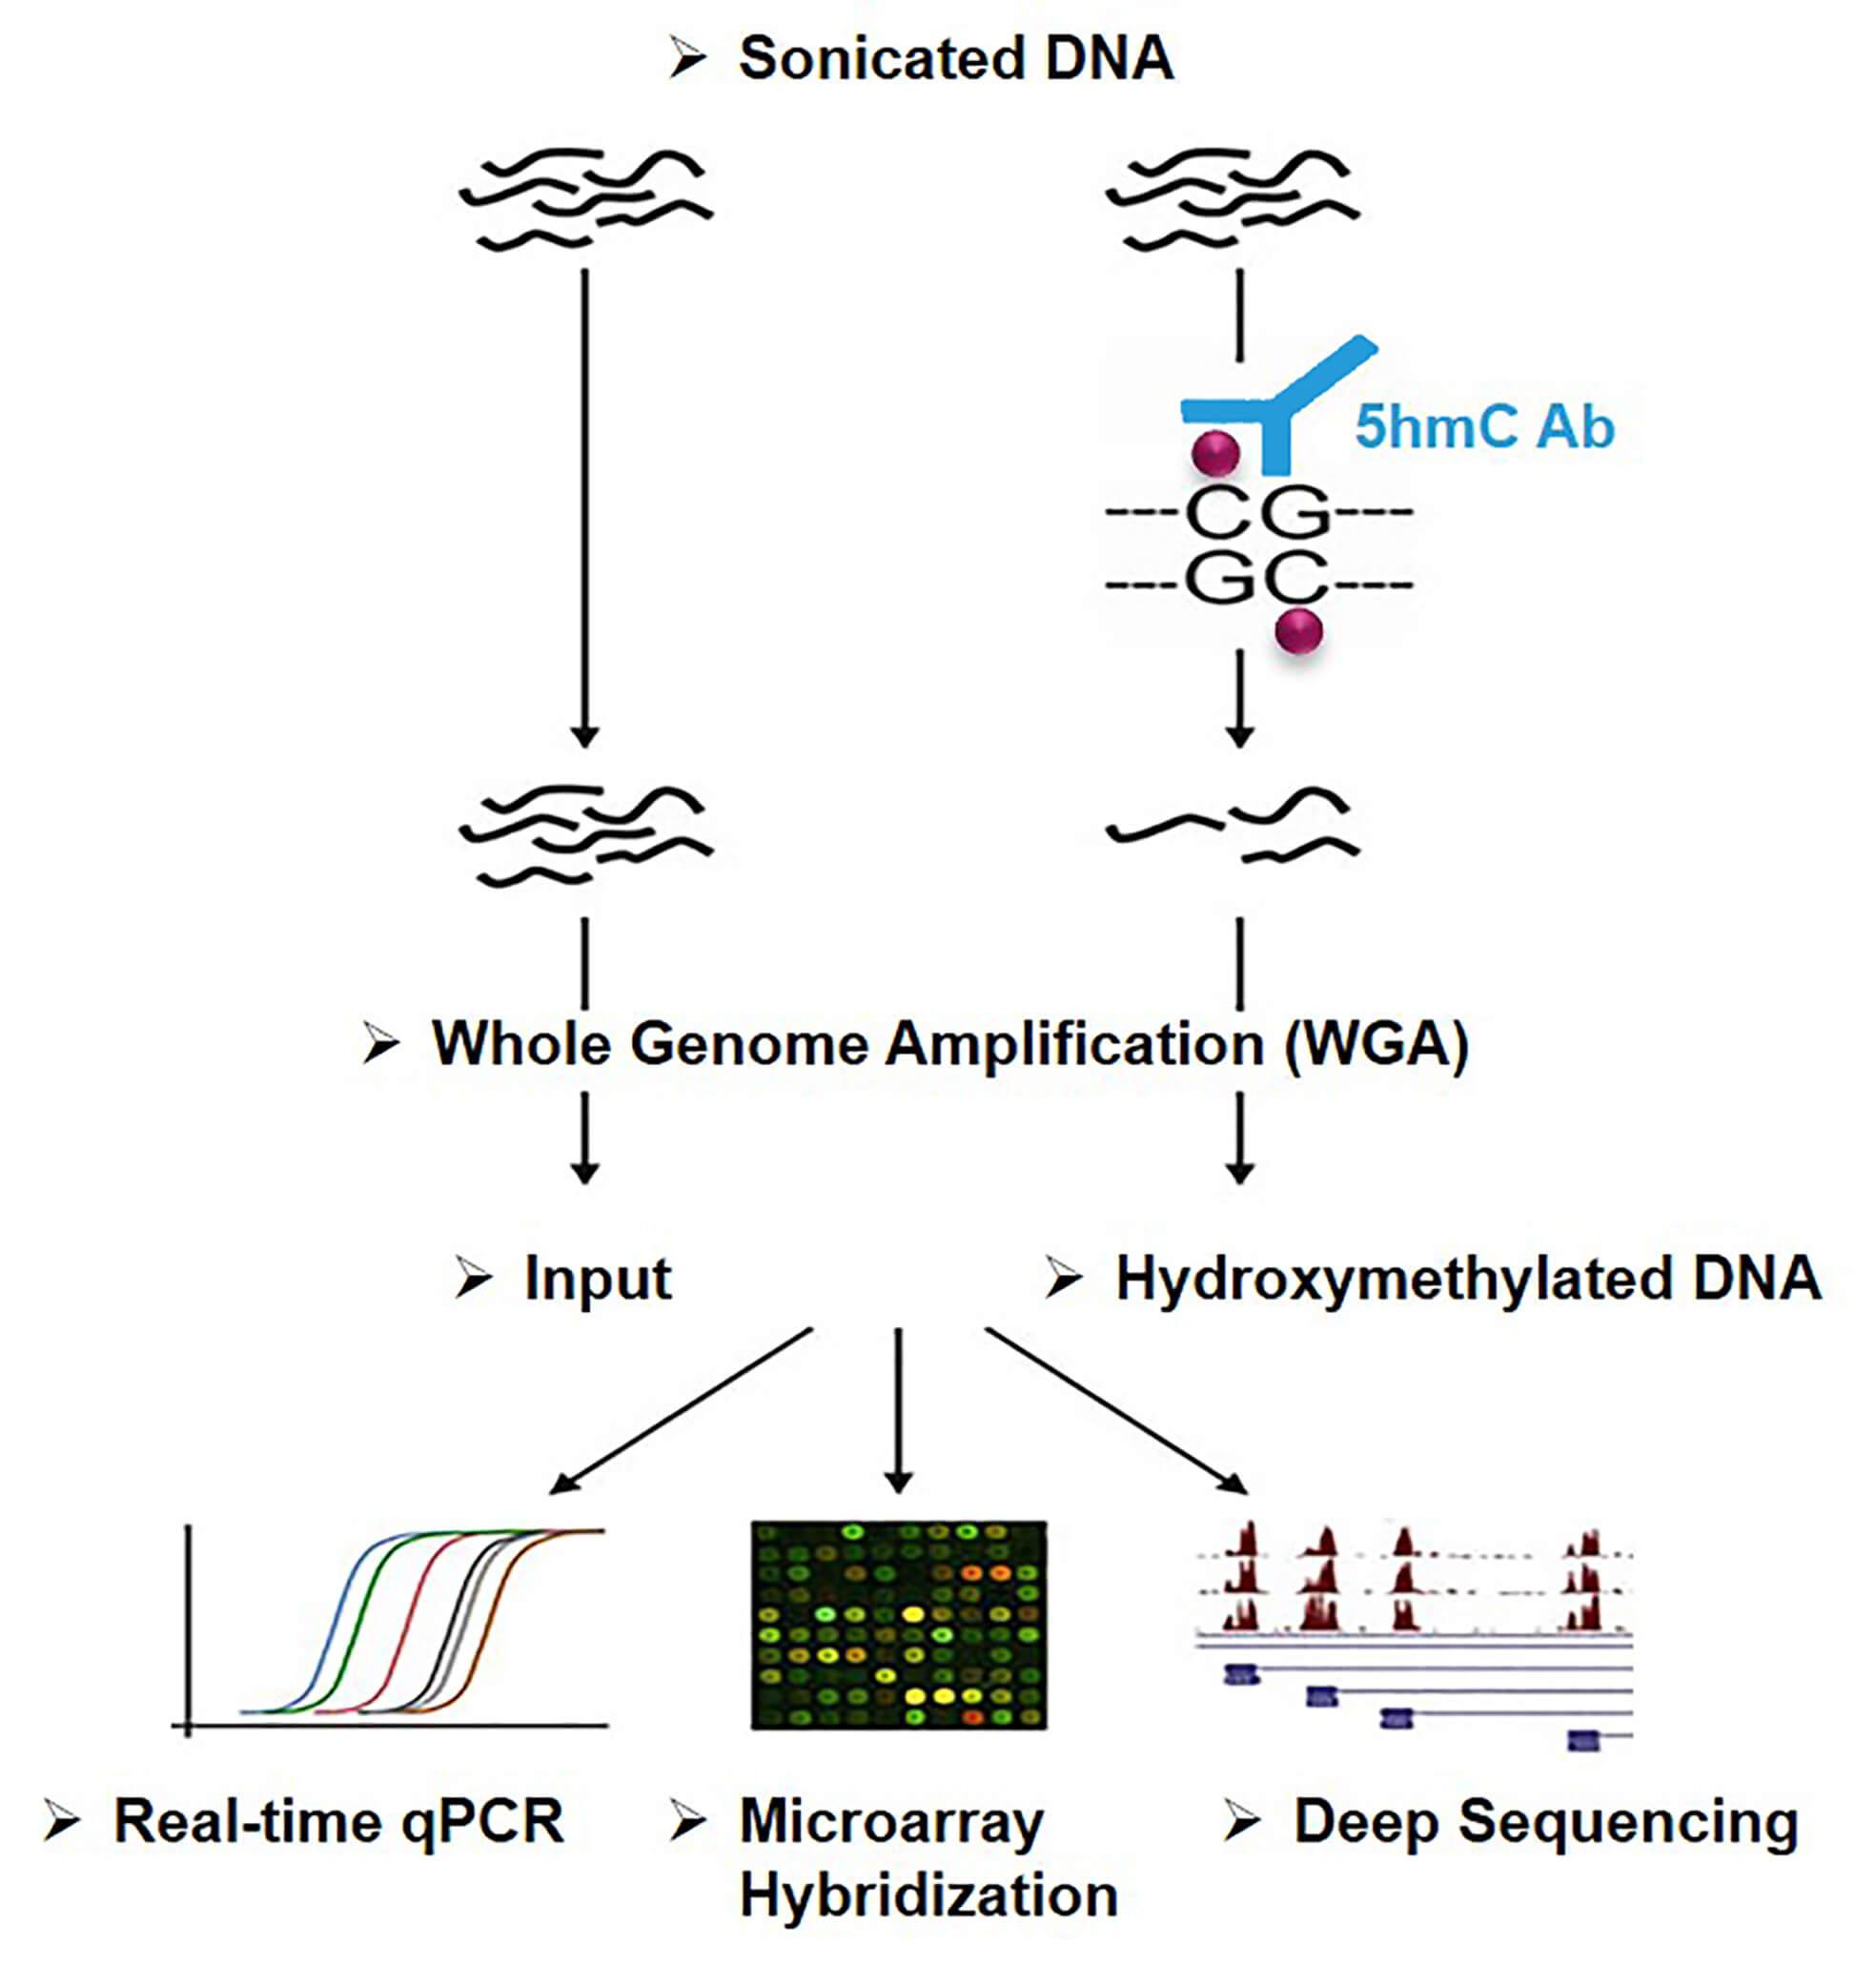 Principle of hydroxymethylated DNA immunoprecipitation (hMeDIP)